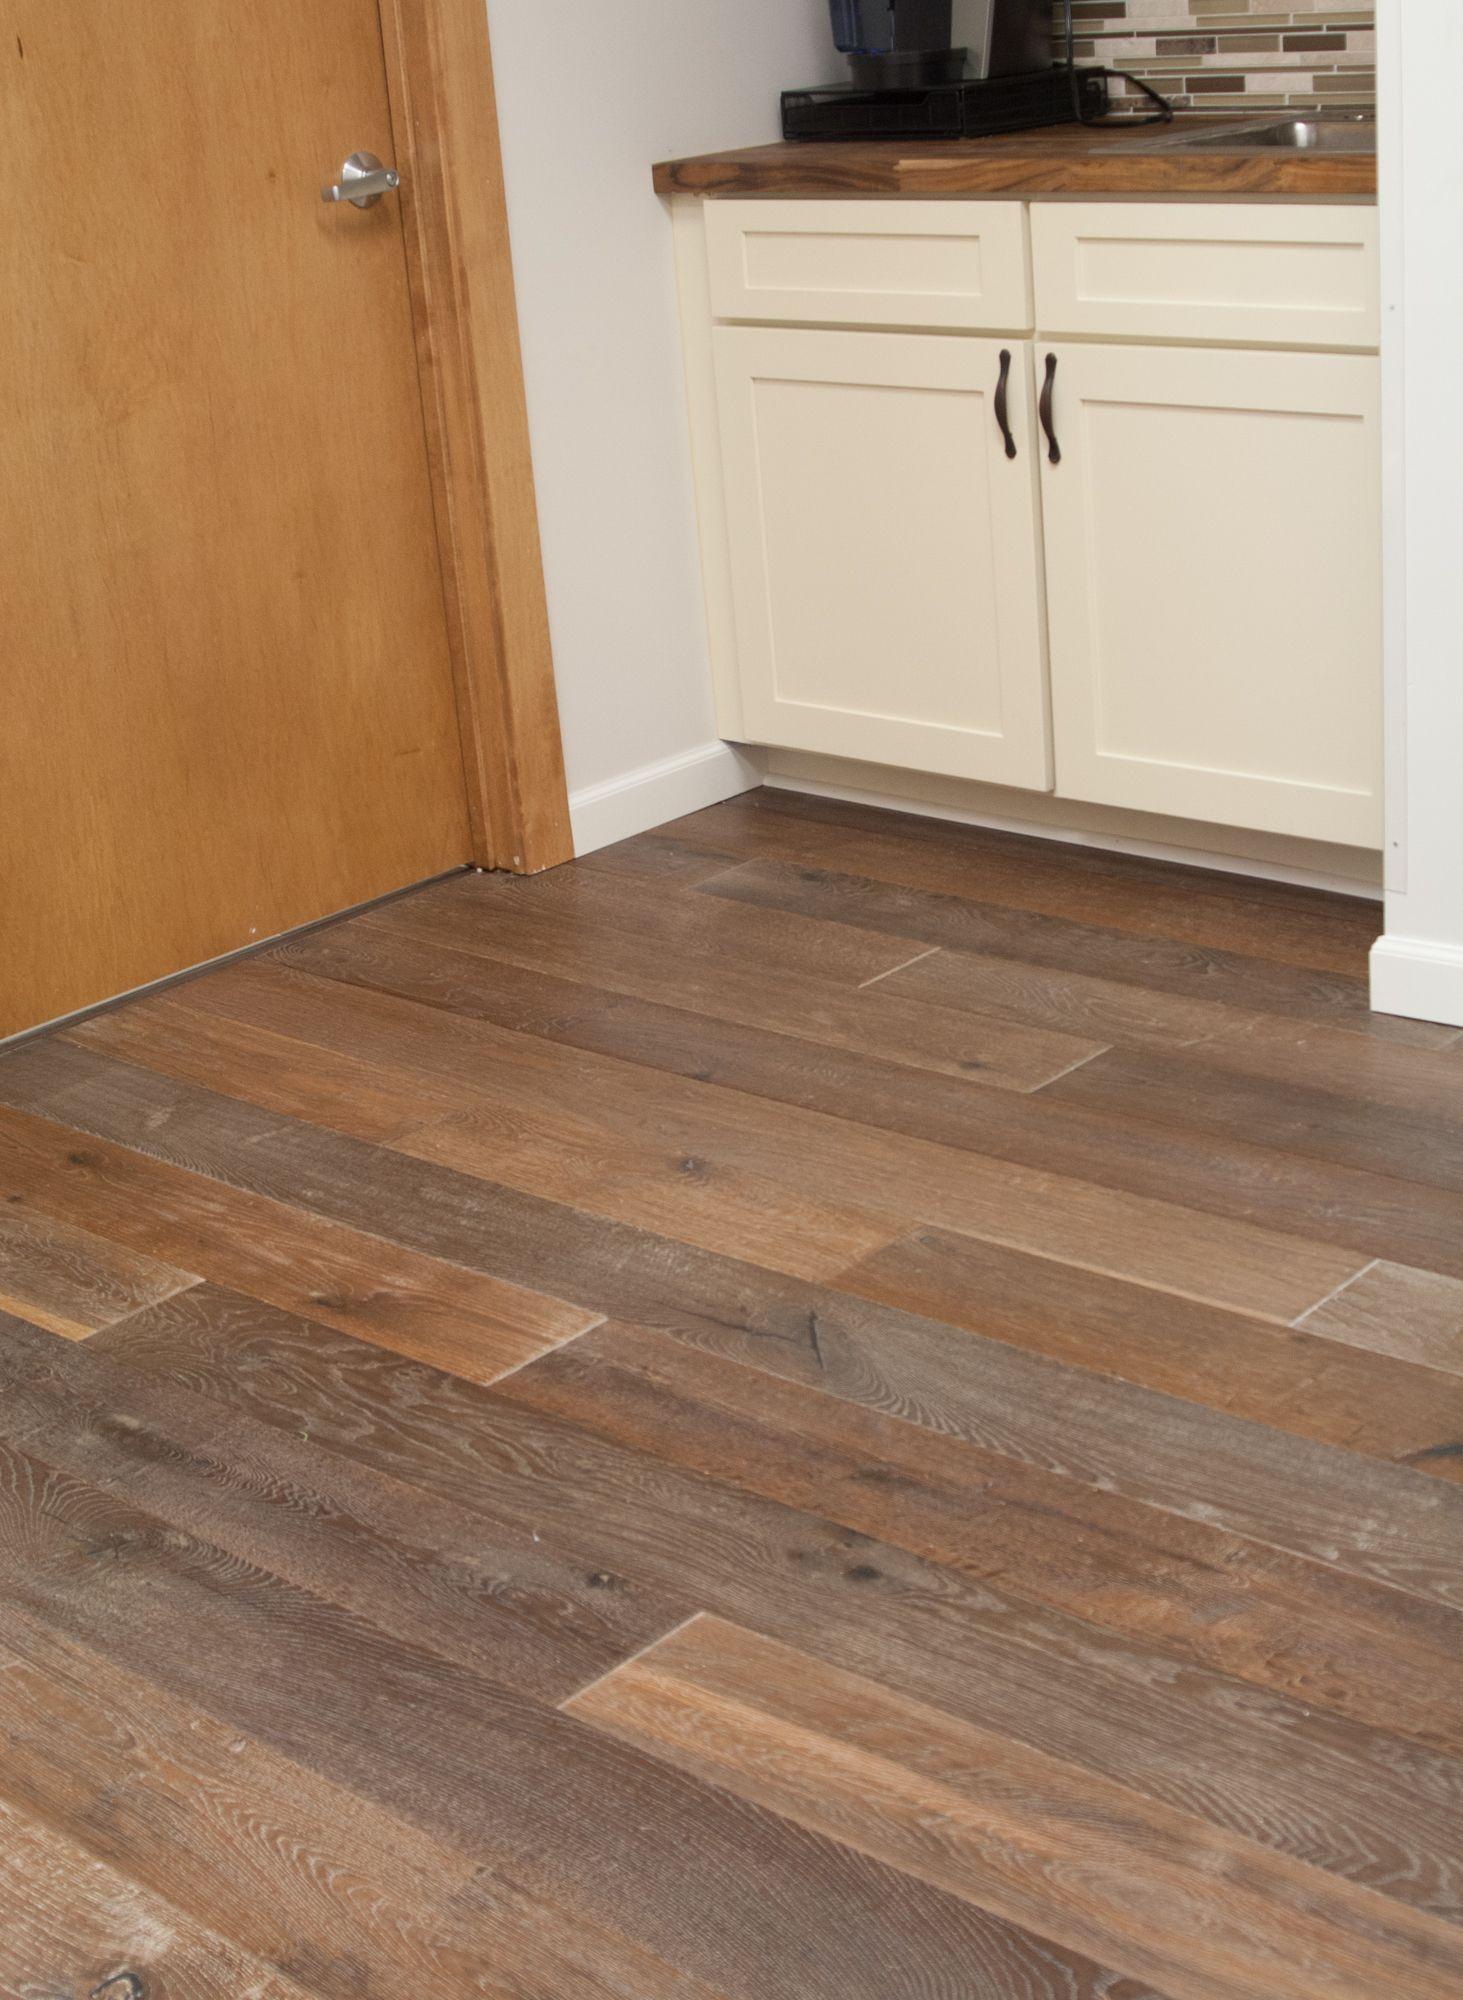 vintage white oak hardwood flooring of vintage costa home ideas pinterest white oak vintage and woods in vintage white oak costa hardwood floor